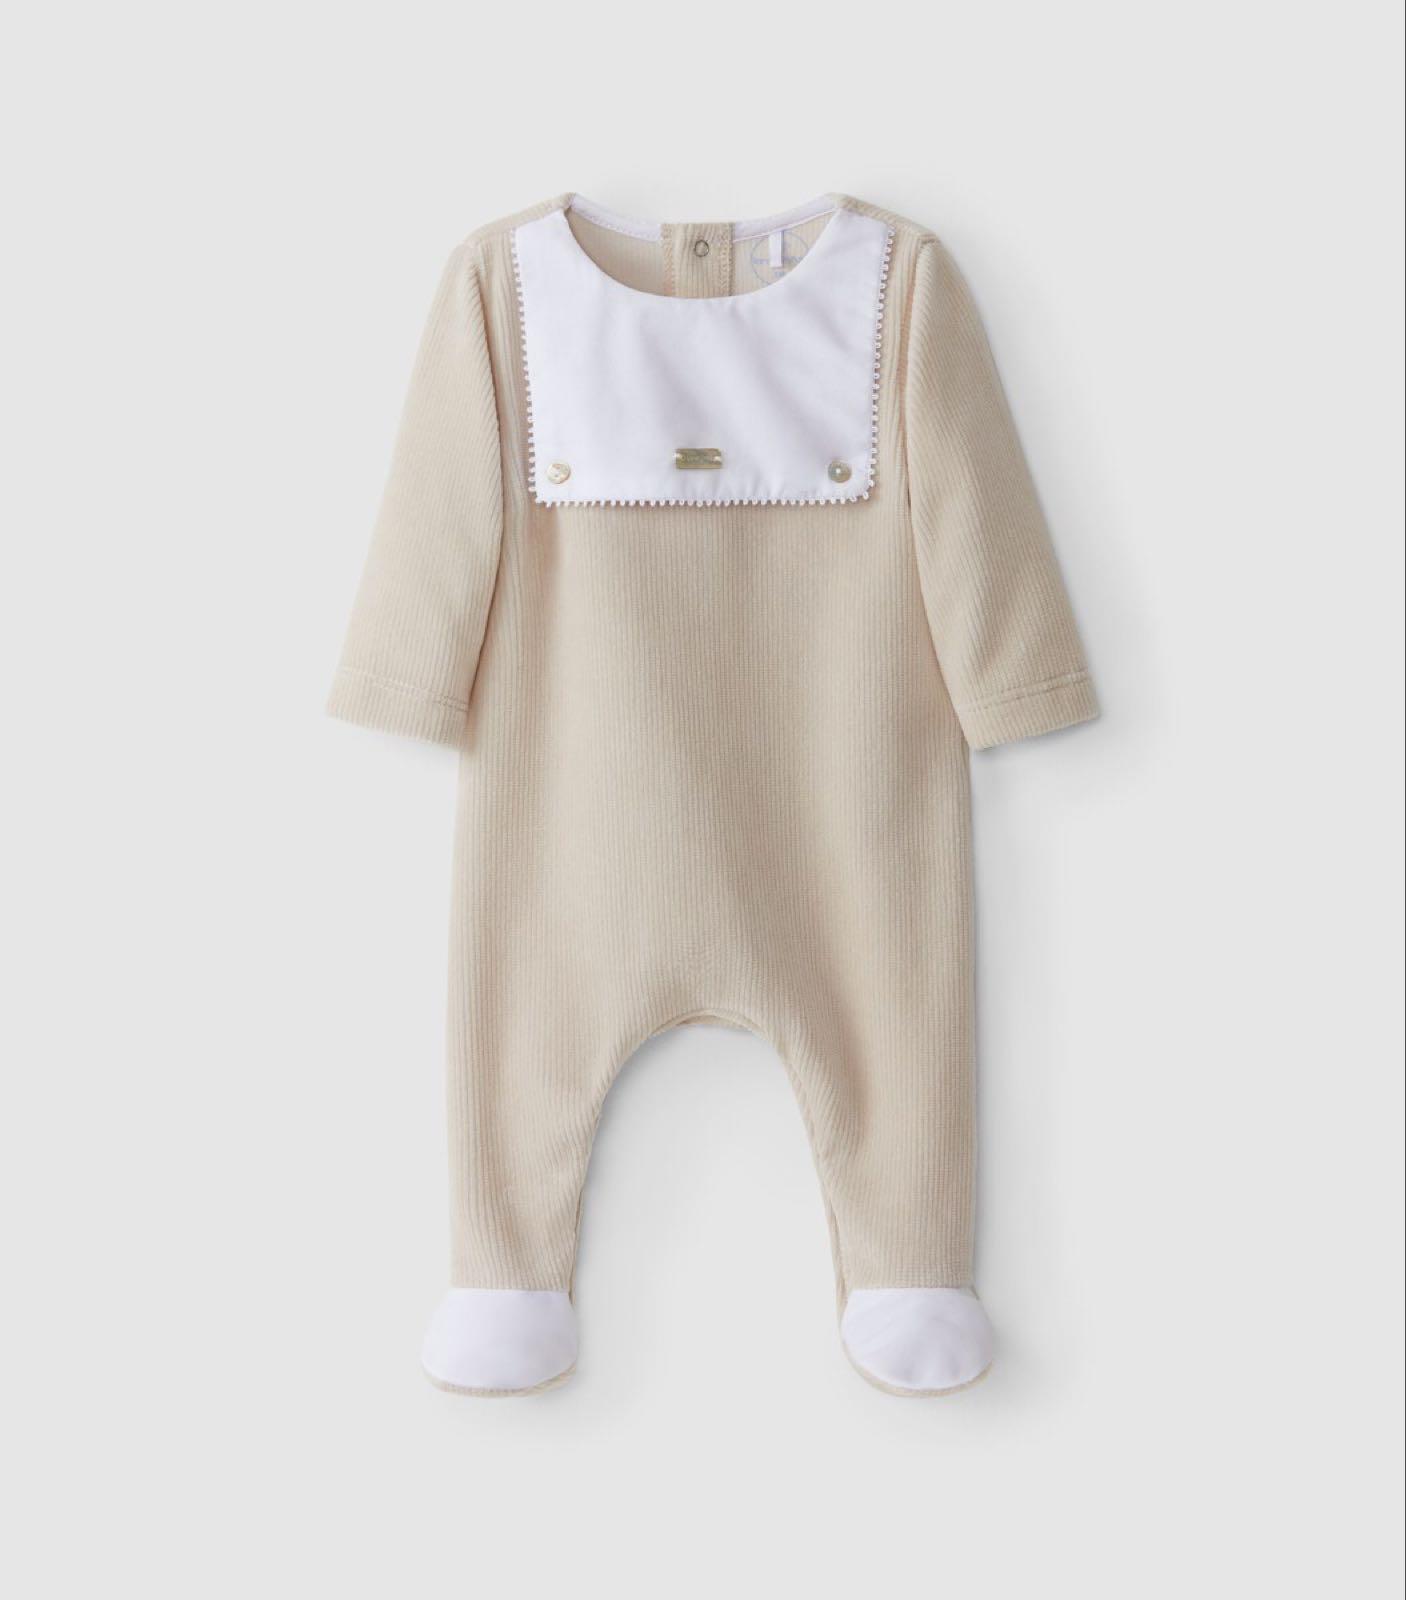 "LARANJINHA BABY Velvet Babygrow ""Laranjinha"" Details 1402-12"